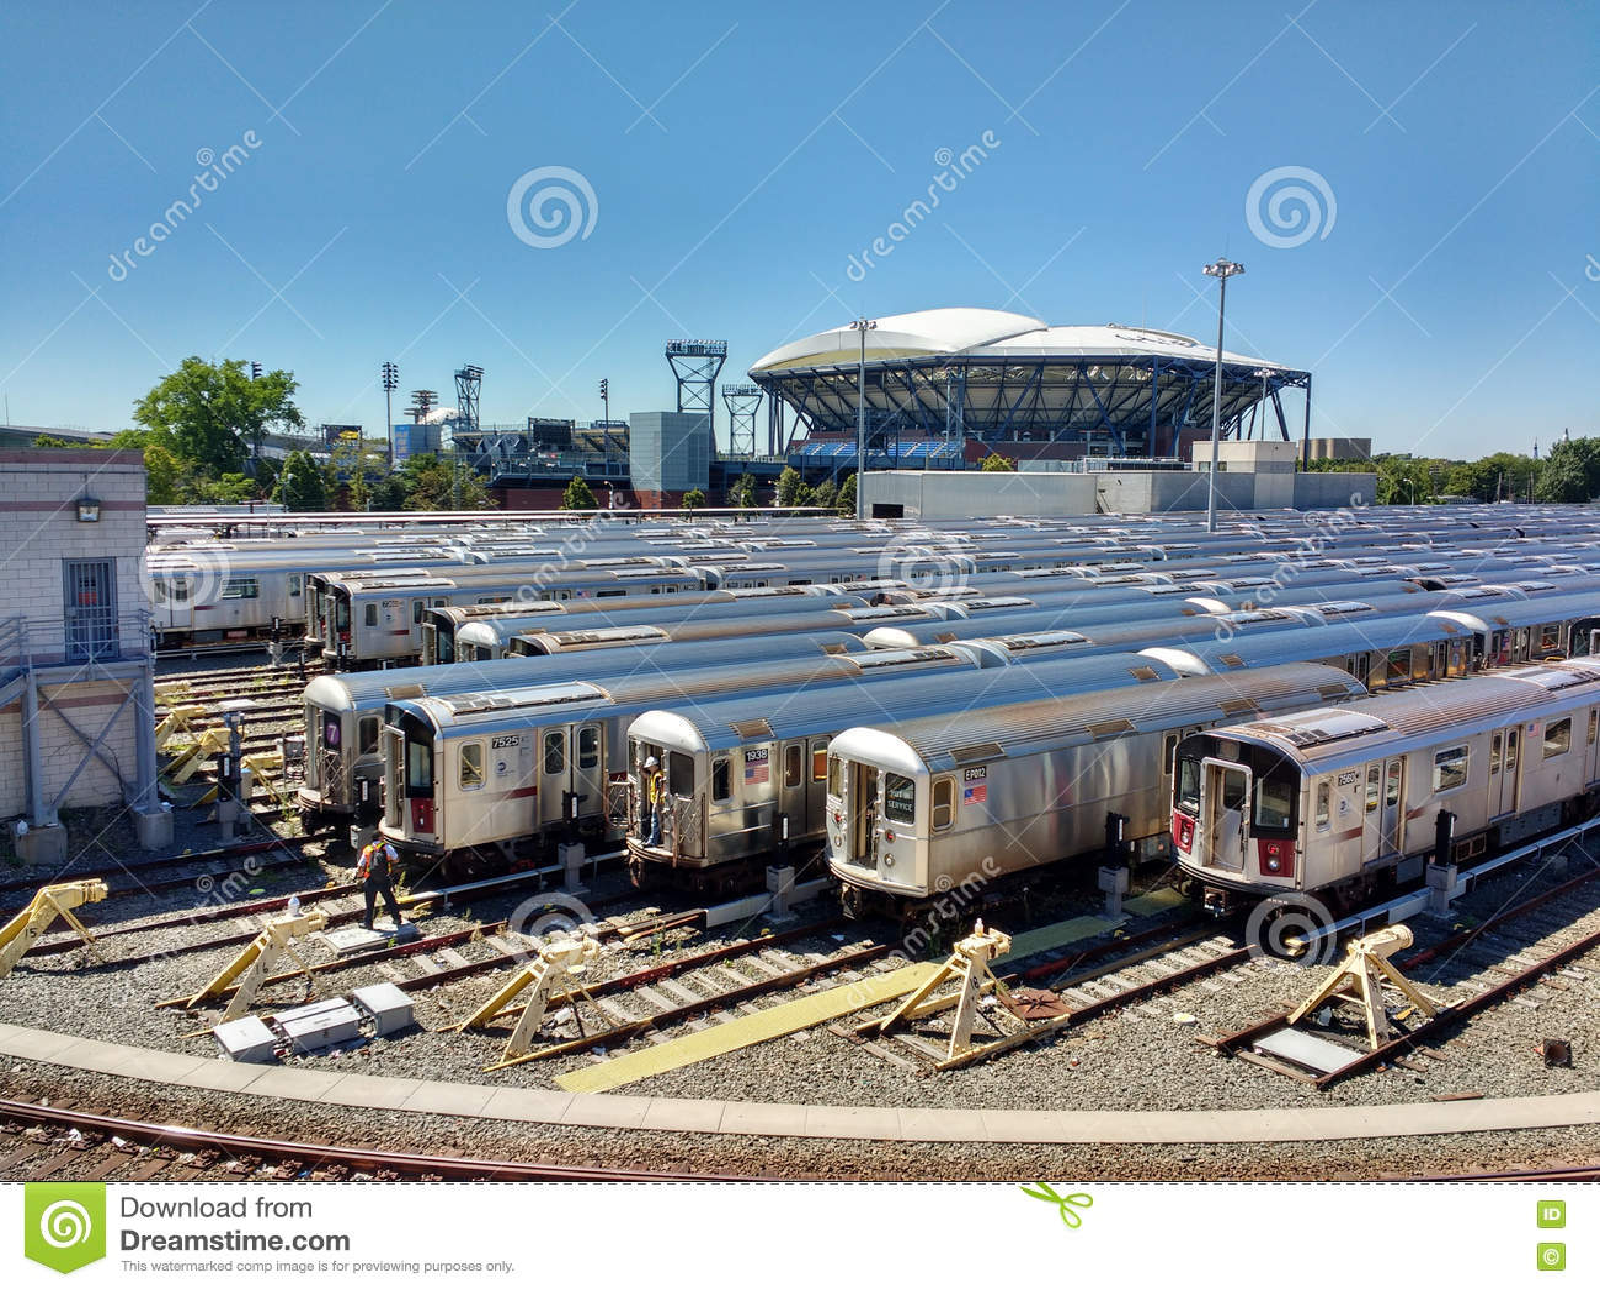 Arthur Ashe Tennis Stadium från Corona Rail Yard, New York, USA